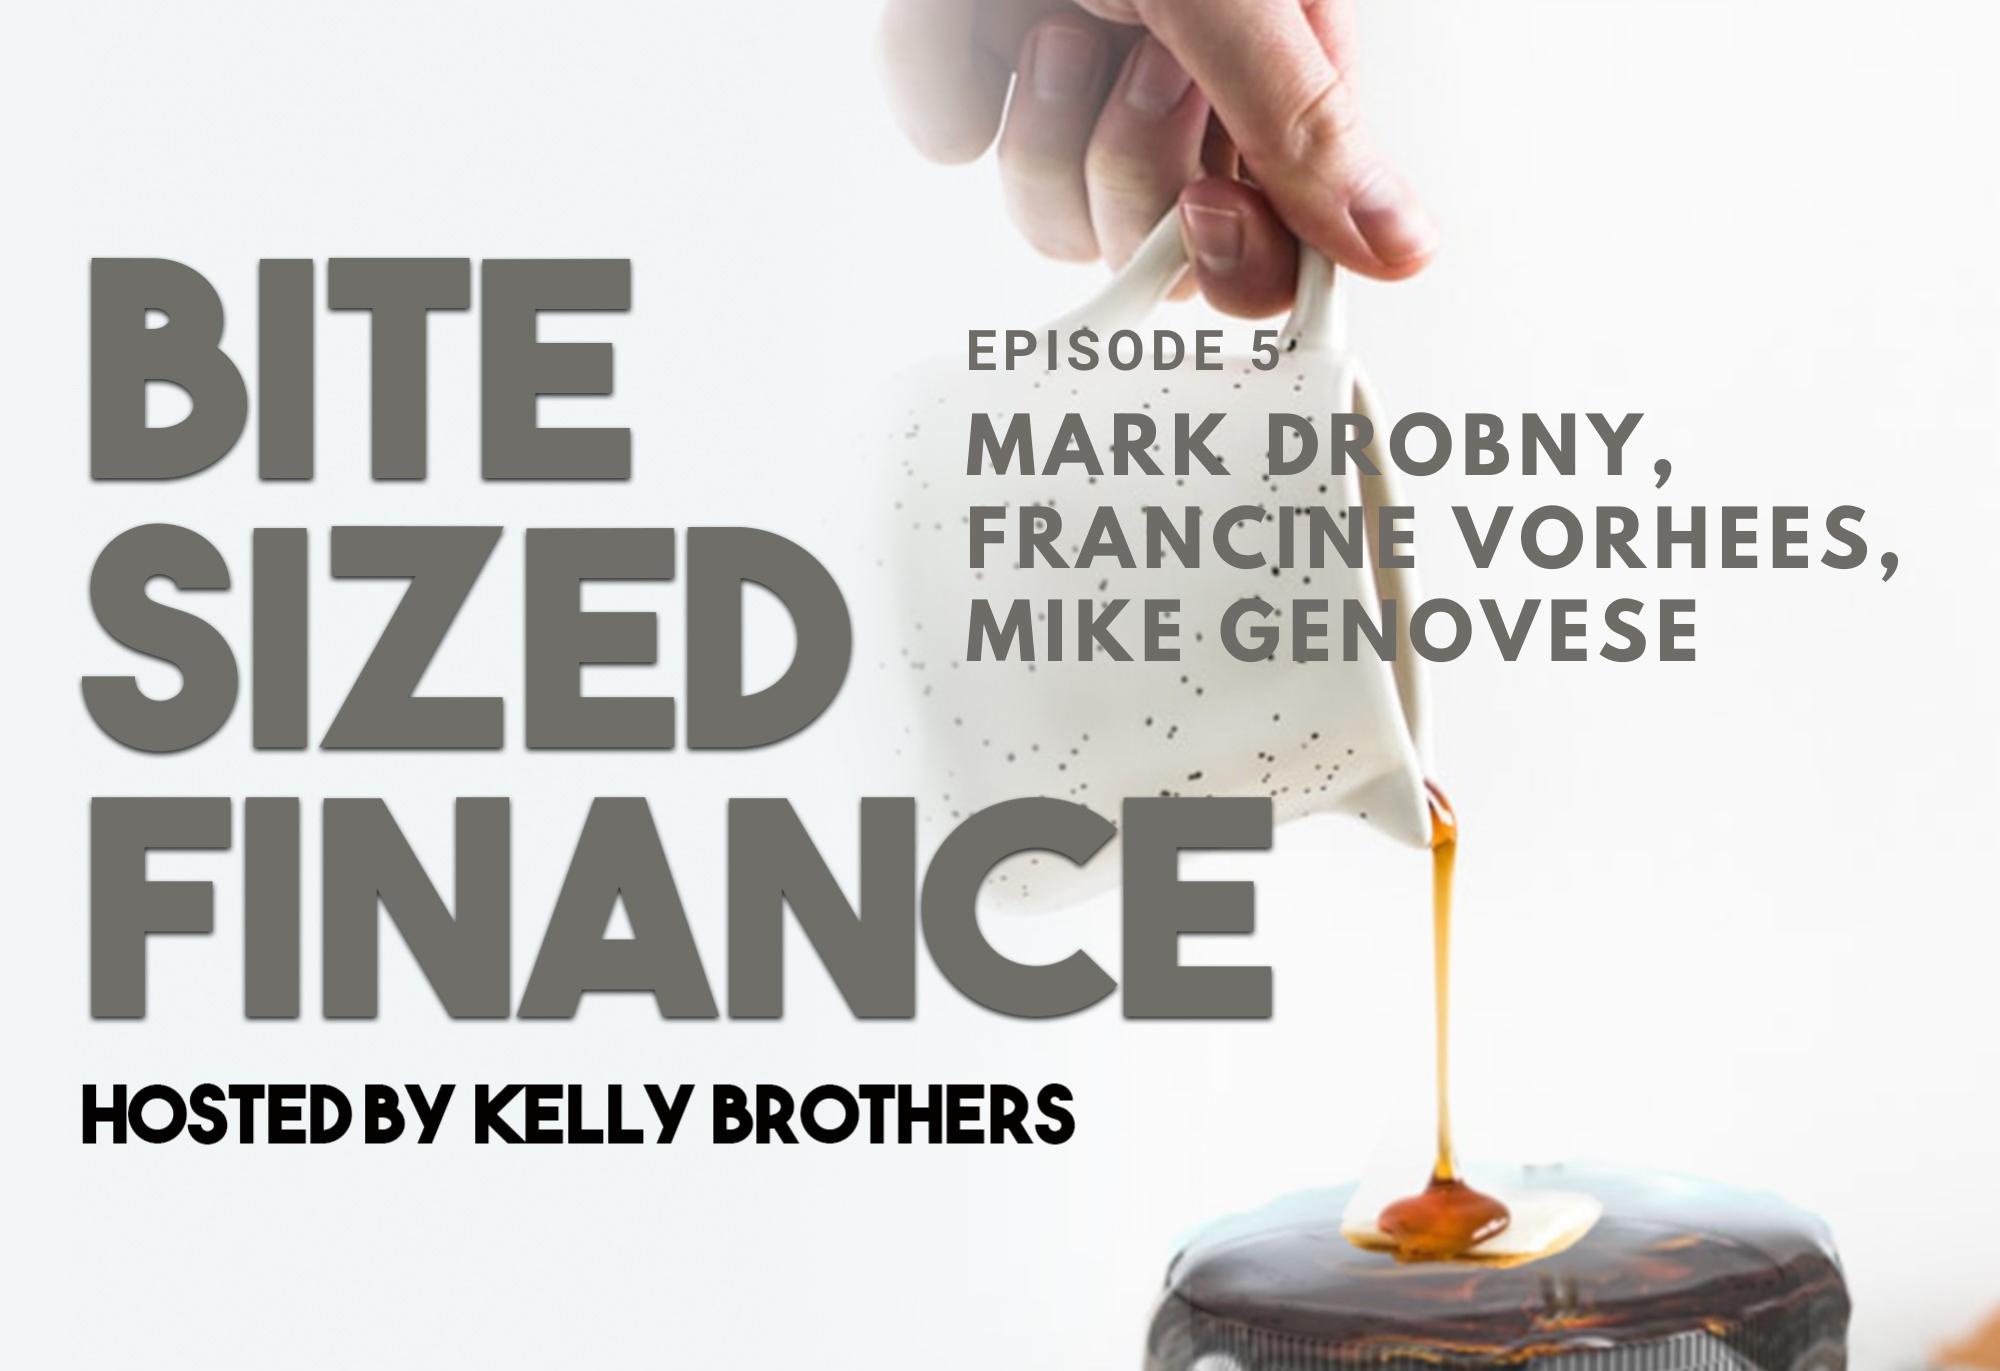 Episode 5 - Mark Drobny, Francince Vorhees, Mike Genovese Thumbnail